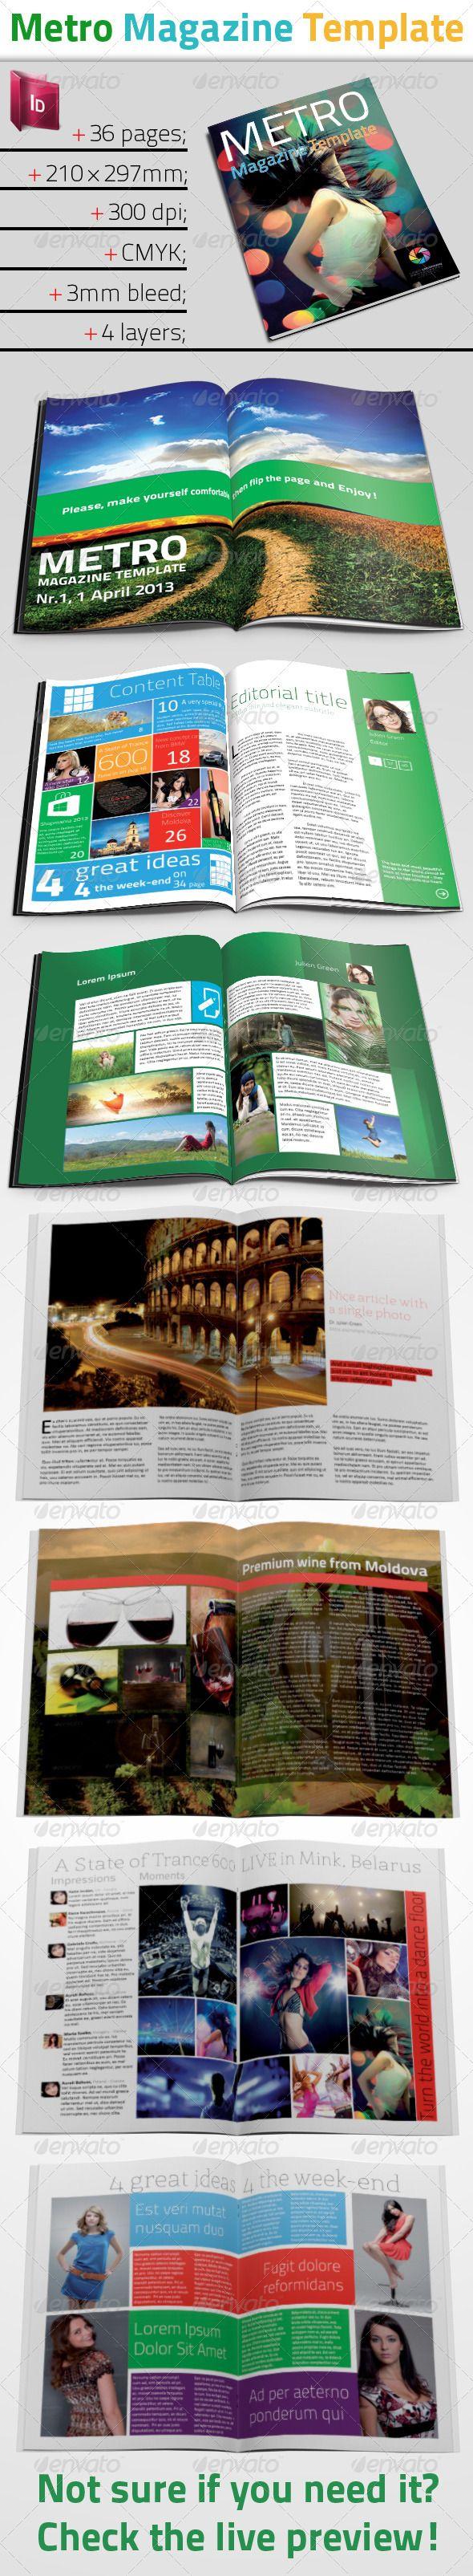 Metro Style Magazine - InDesign Template